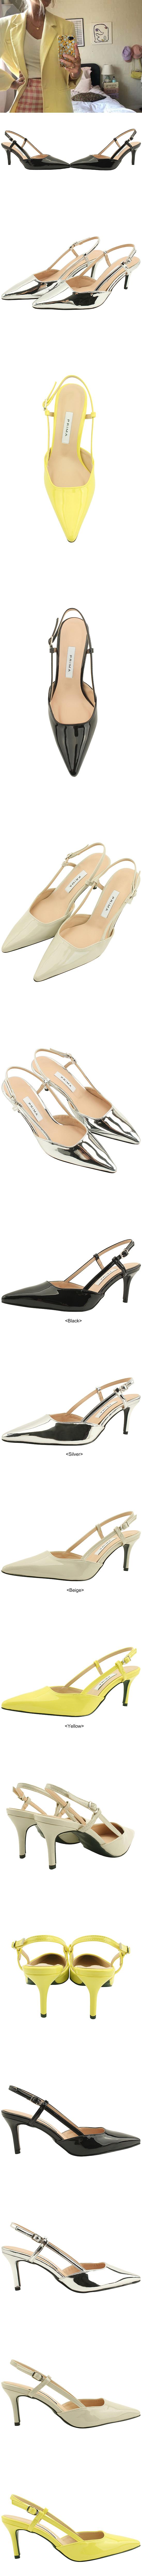 Enamel stiletto strap high heels silver